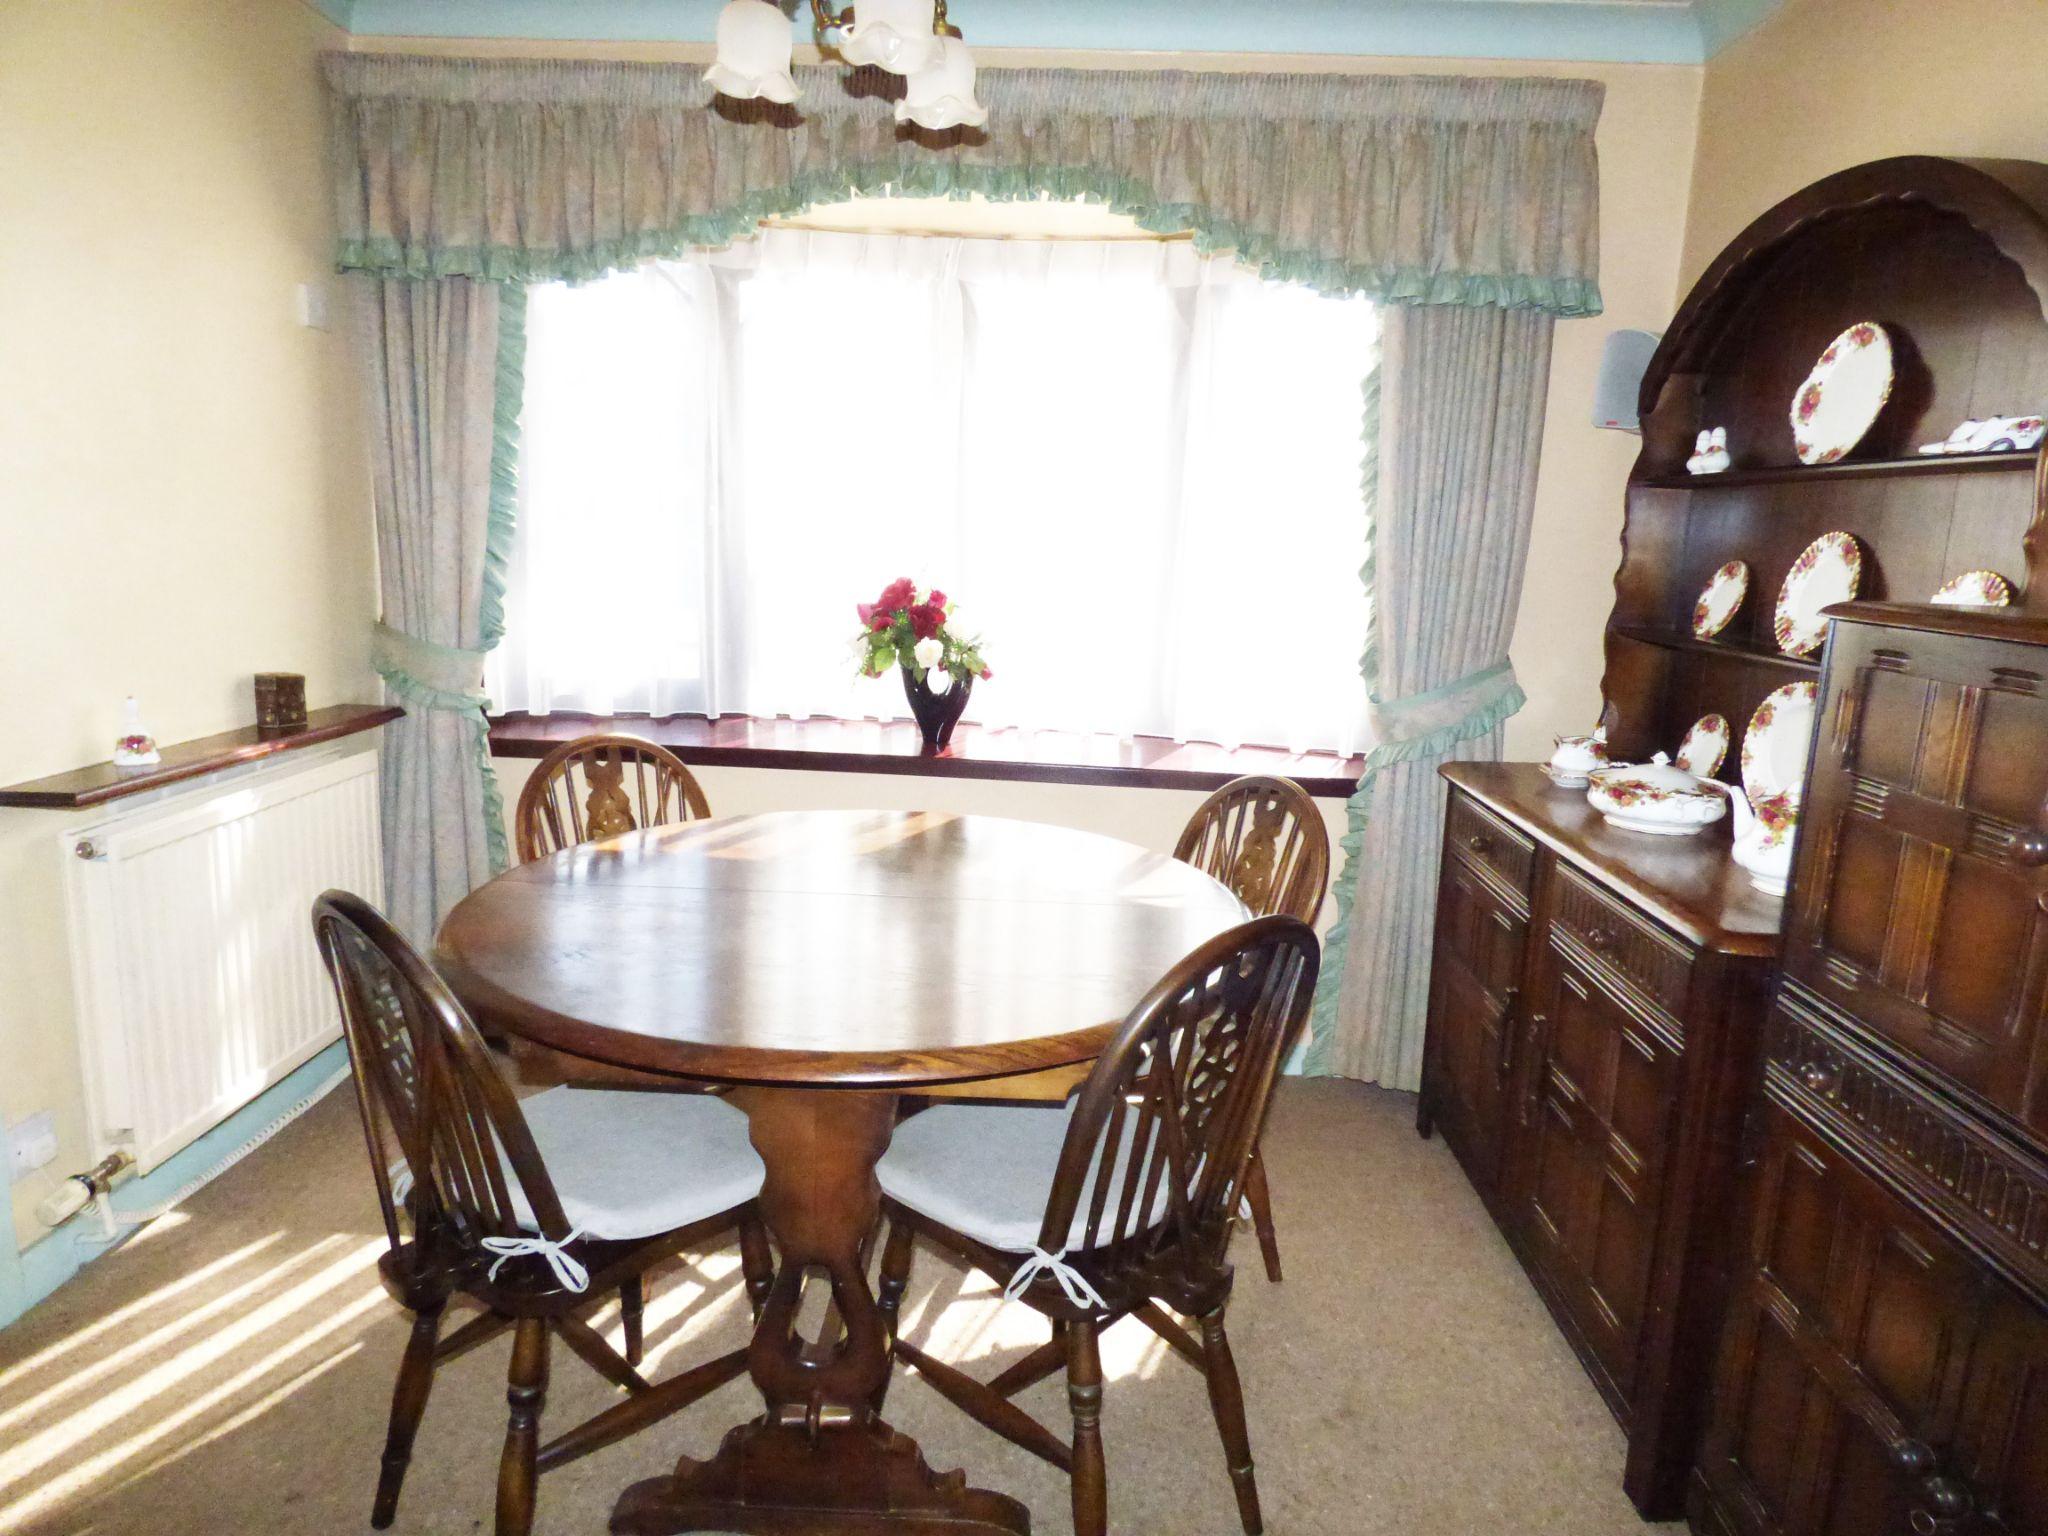 3 Bedroom Detached House For Sale - Dining Room